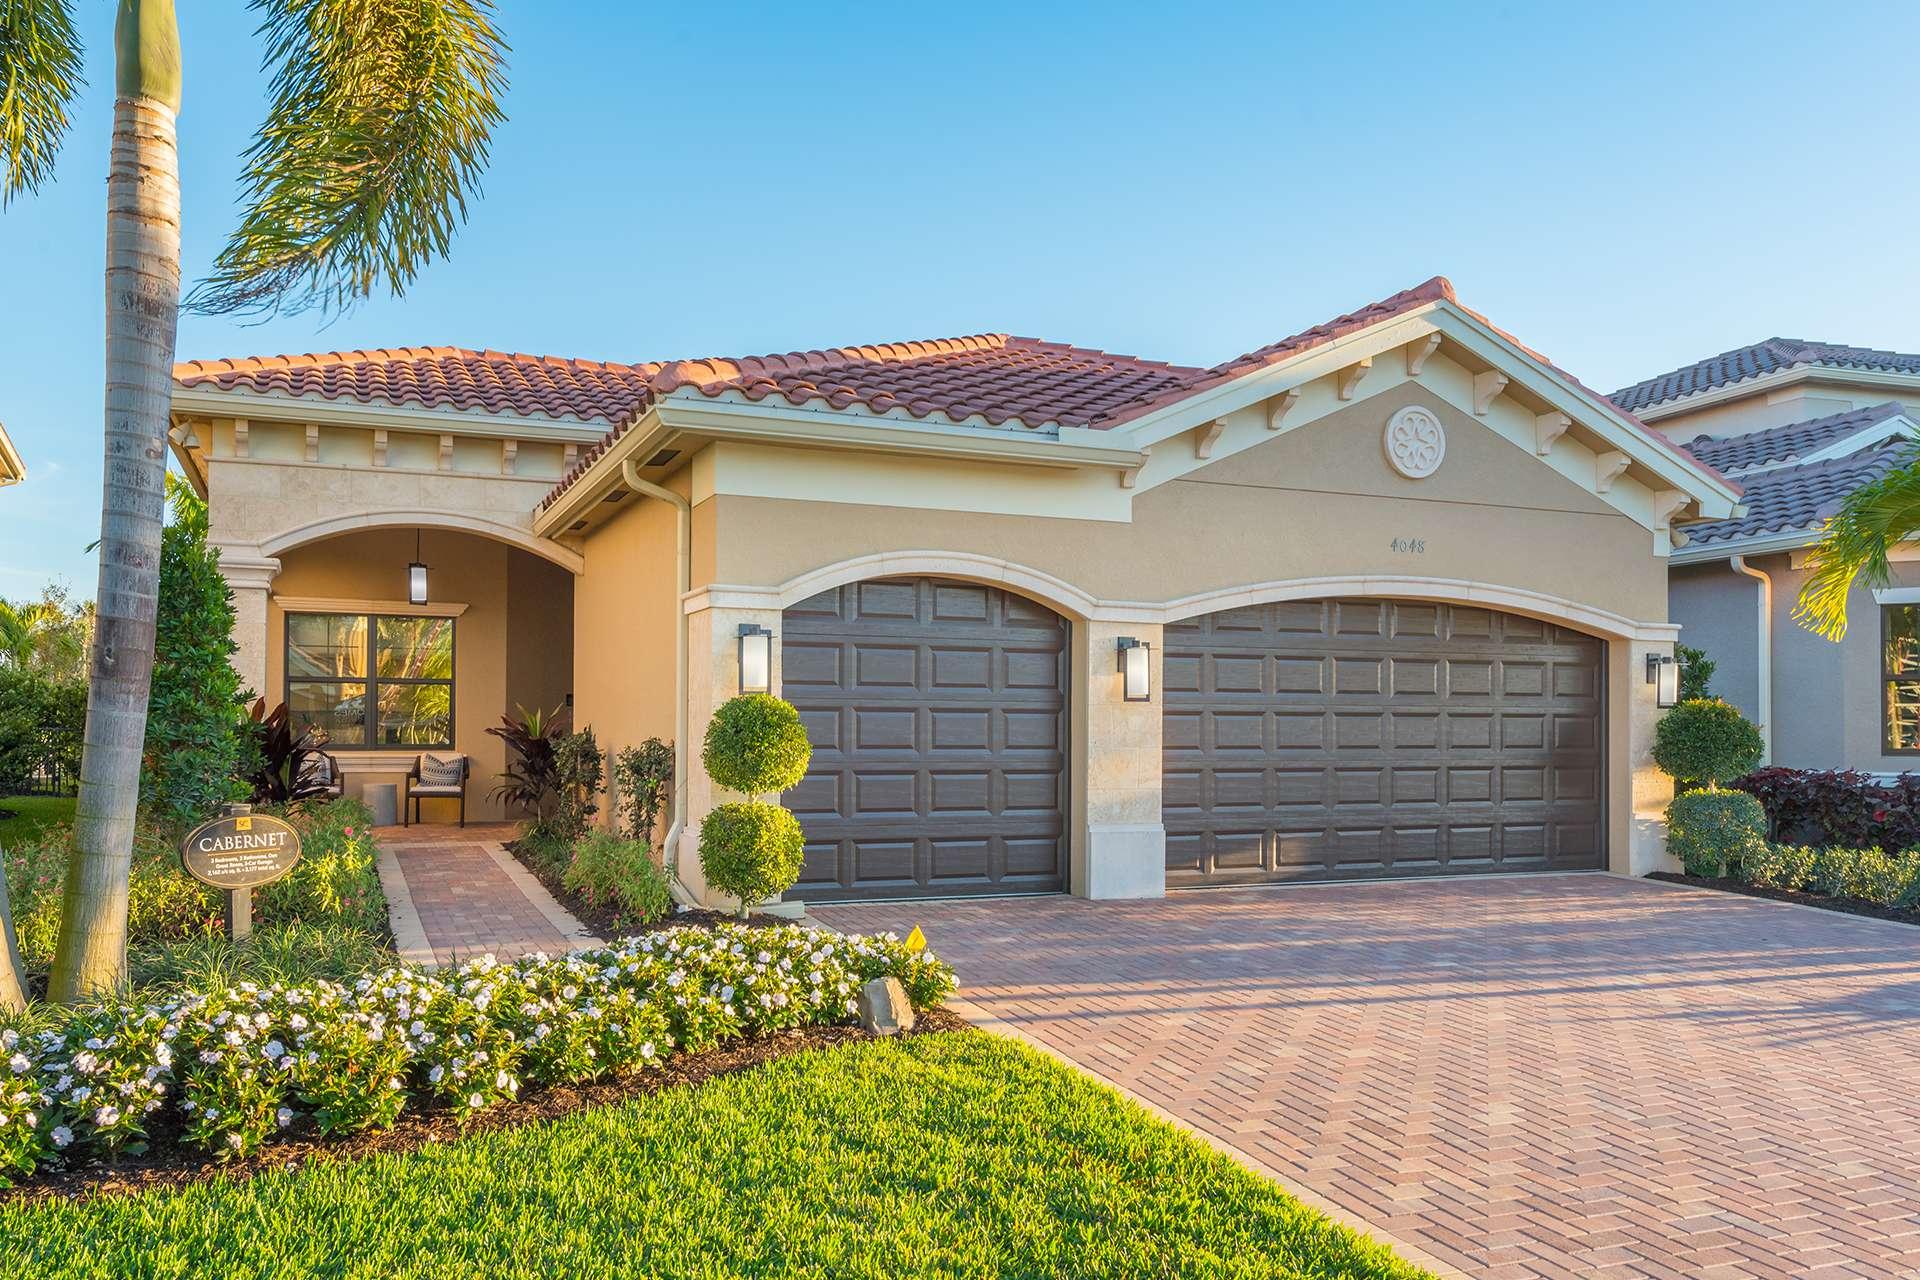 Homes for Sale Naples   Florida Real Estate - GL Homes